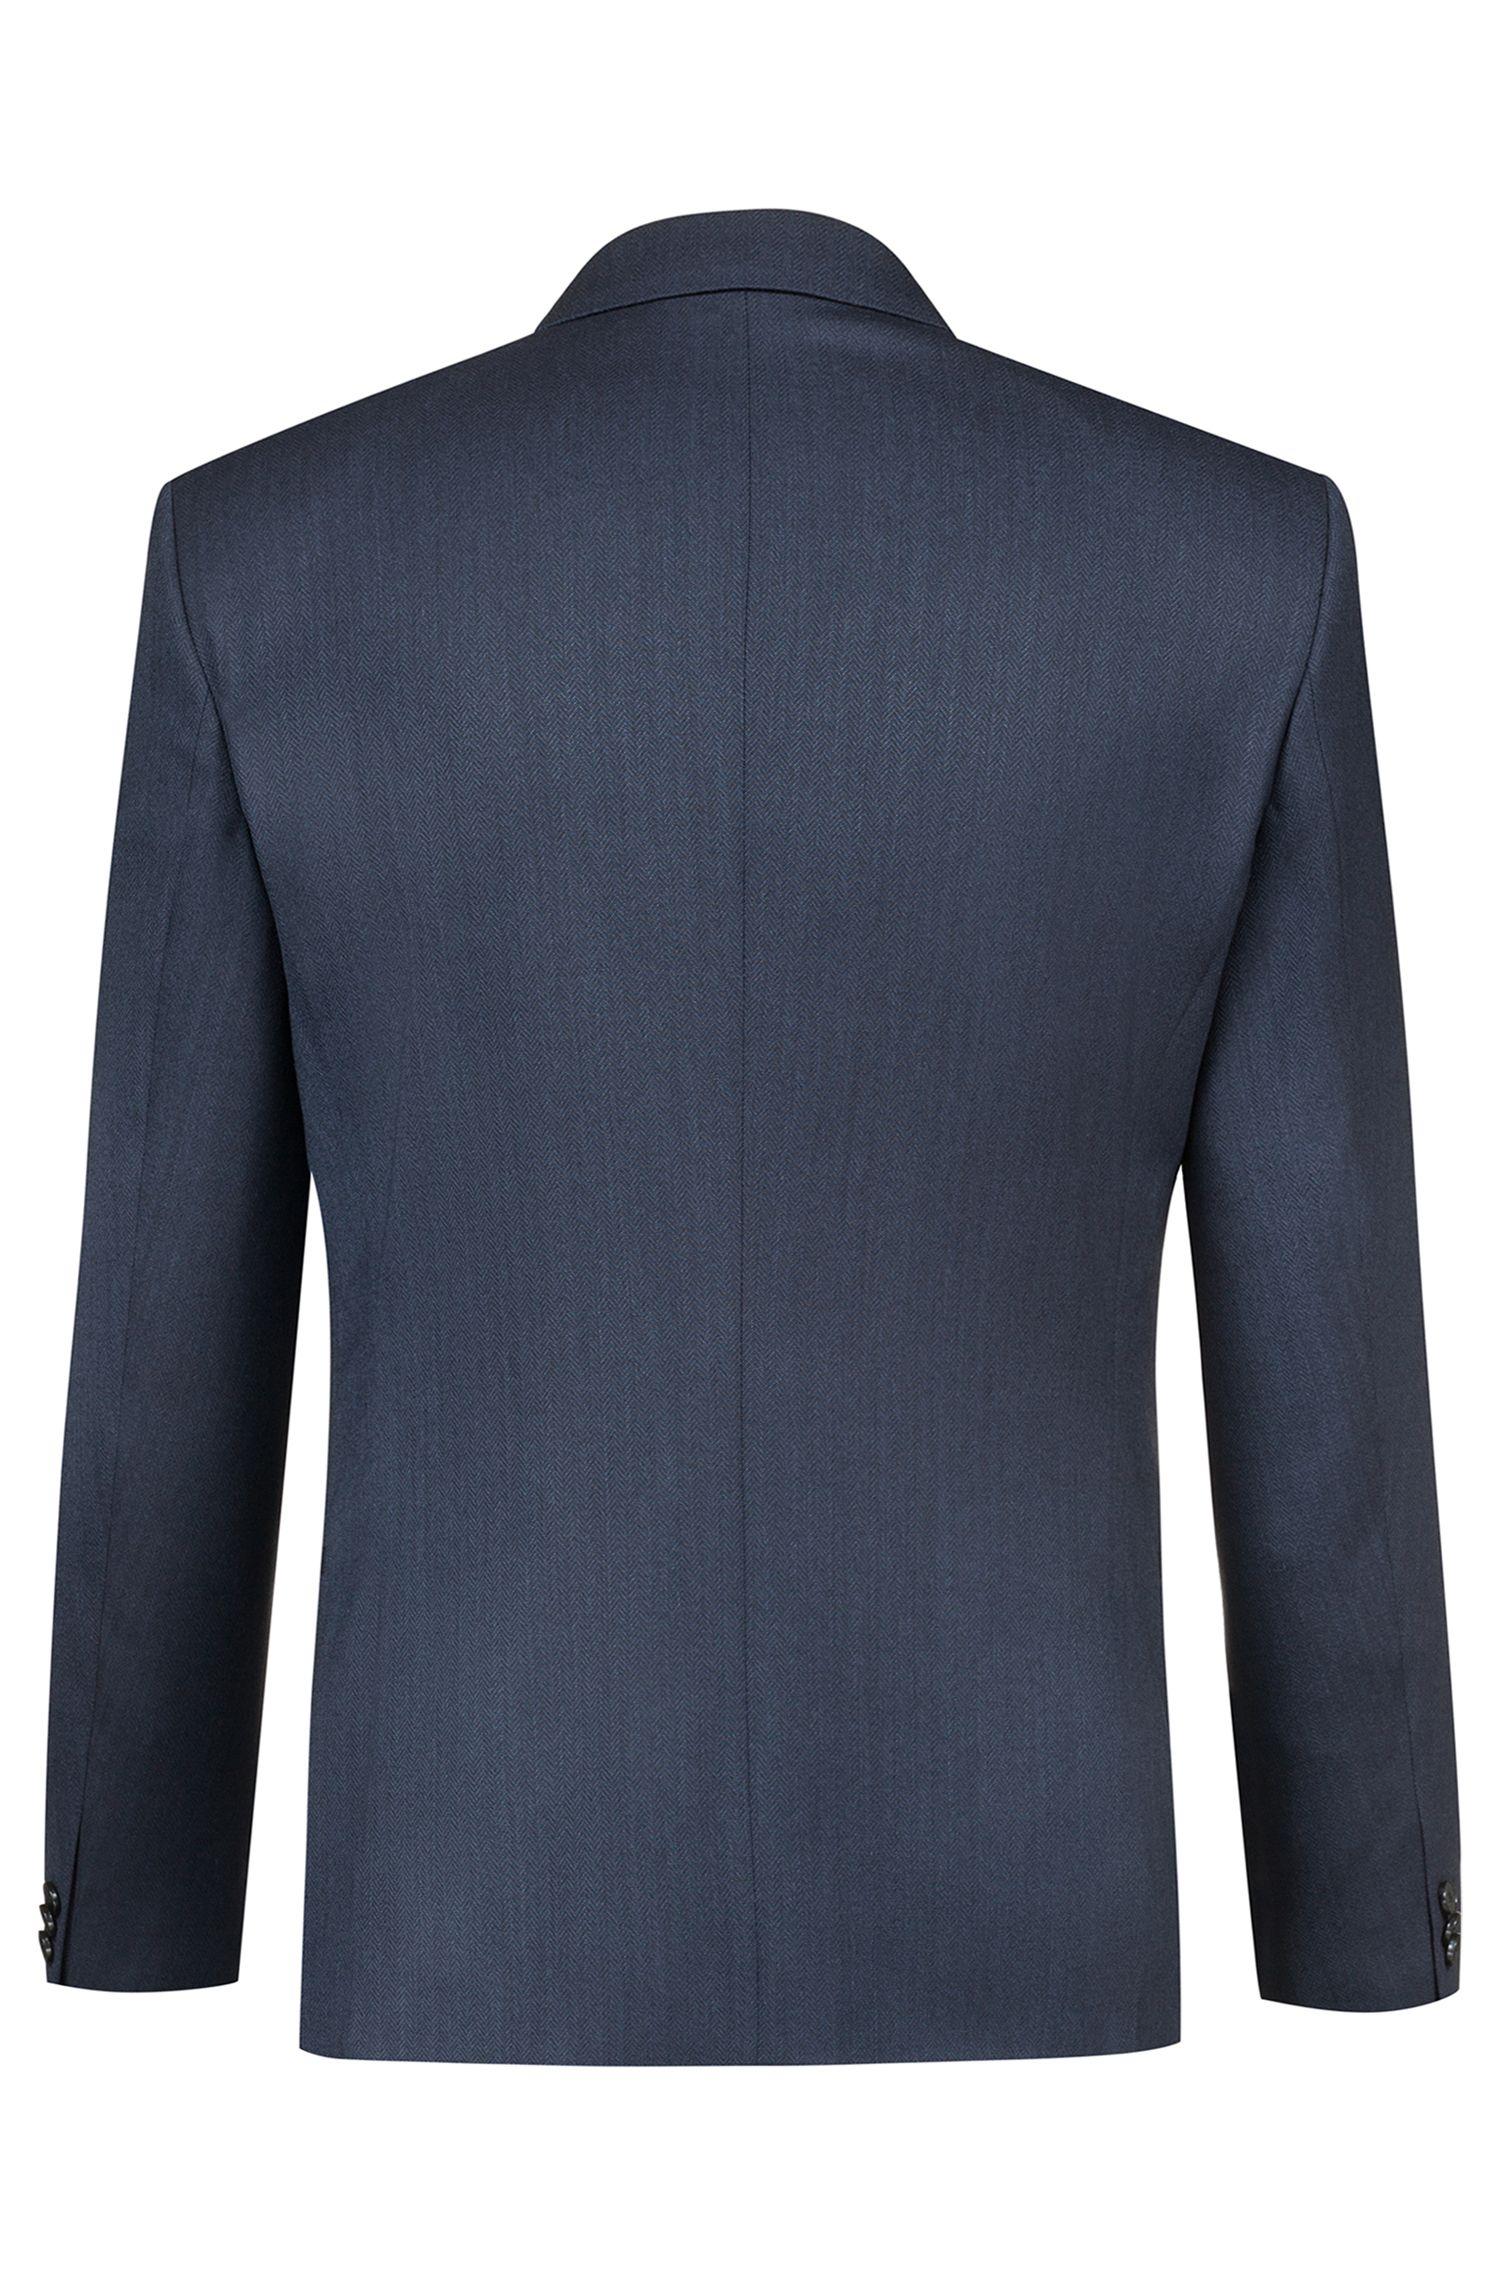 Extra-slim-fit three-piece suit in herringbone stretch wool, Dark Blue